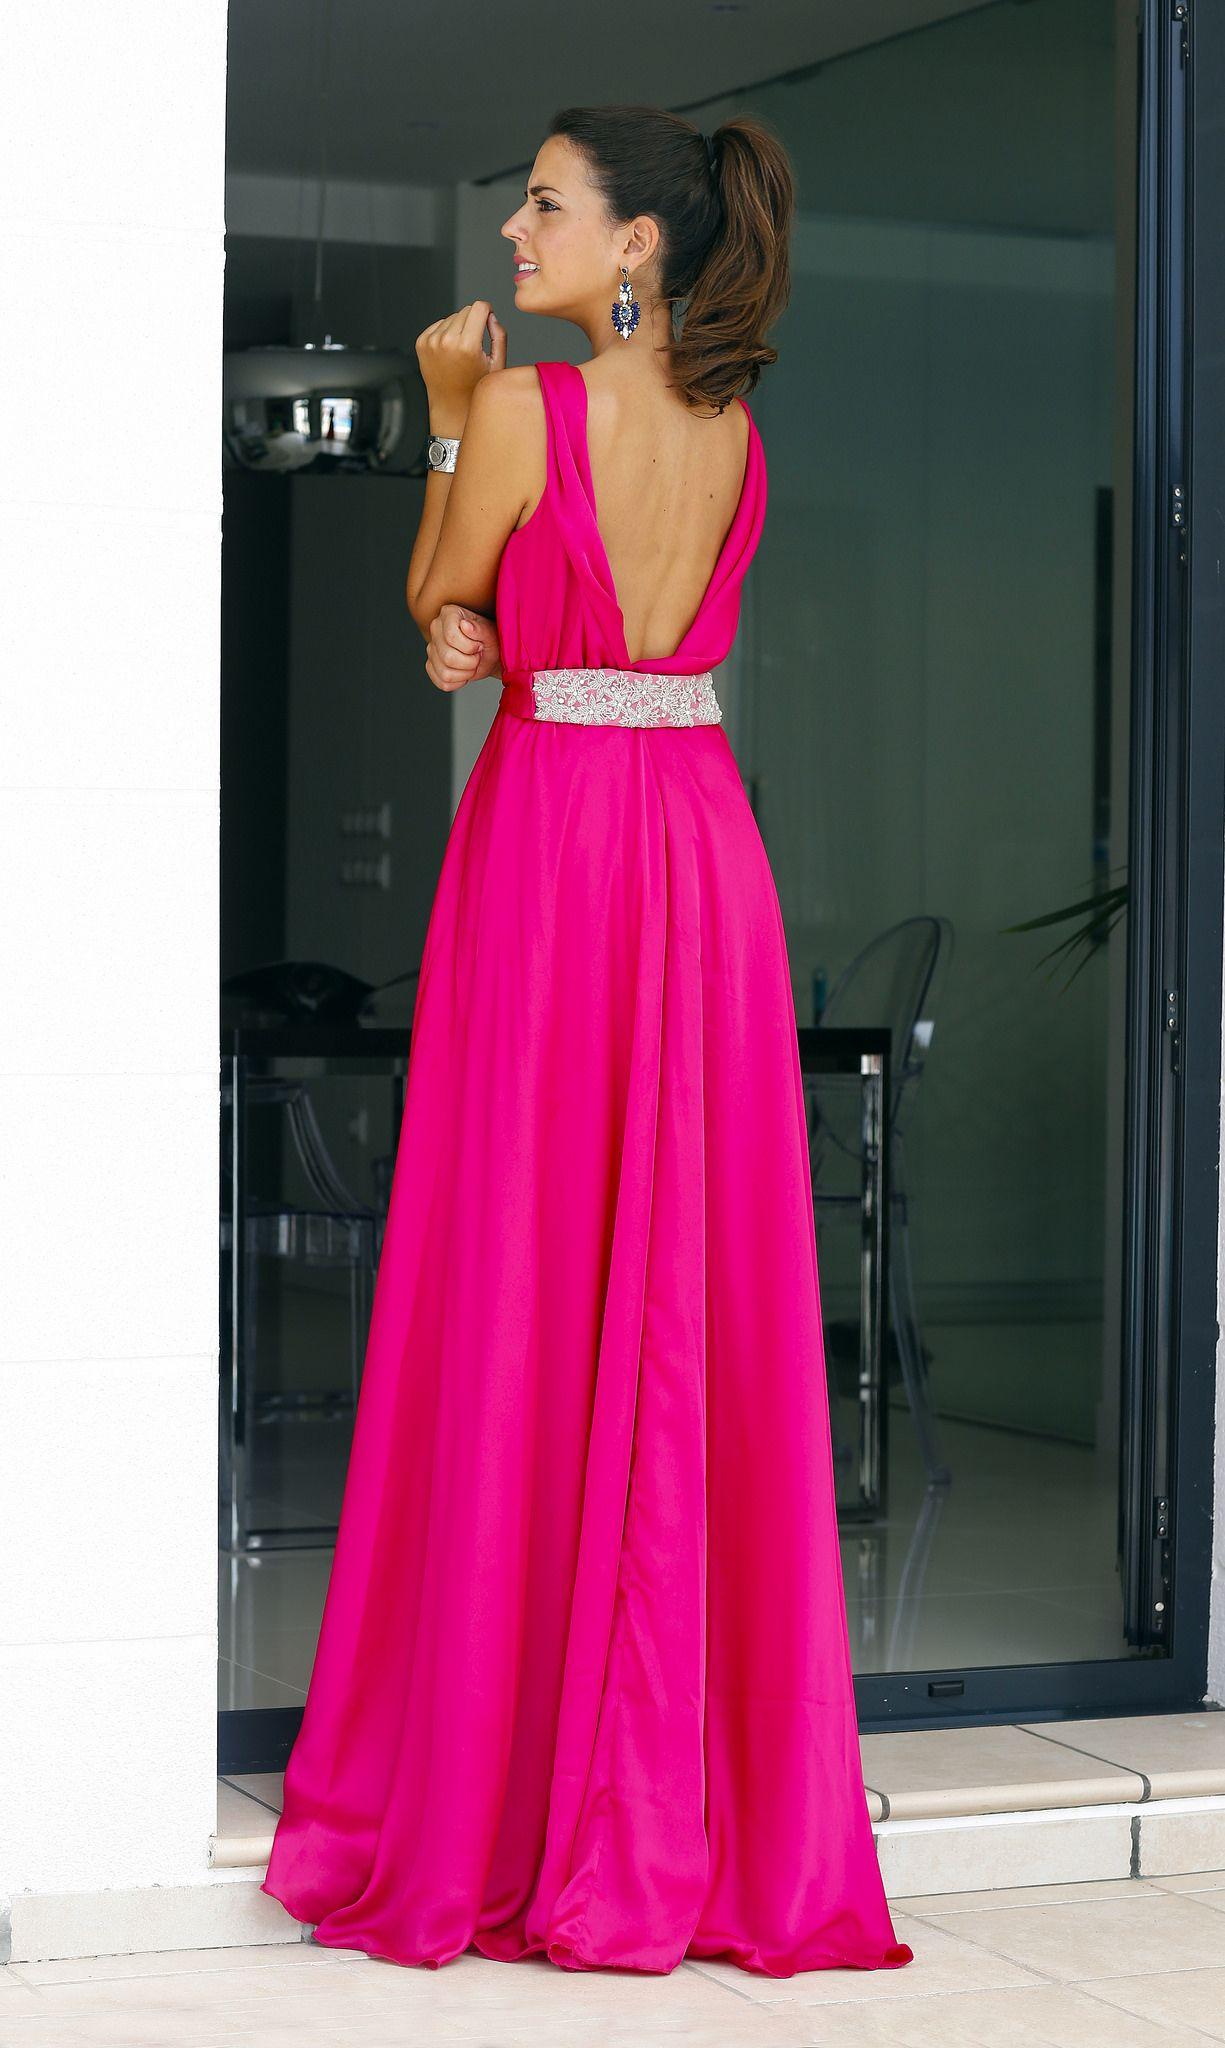 _96B5048 | wedding | Pinterest | Moda rosada, Ventana y Neón